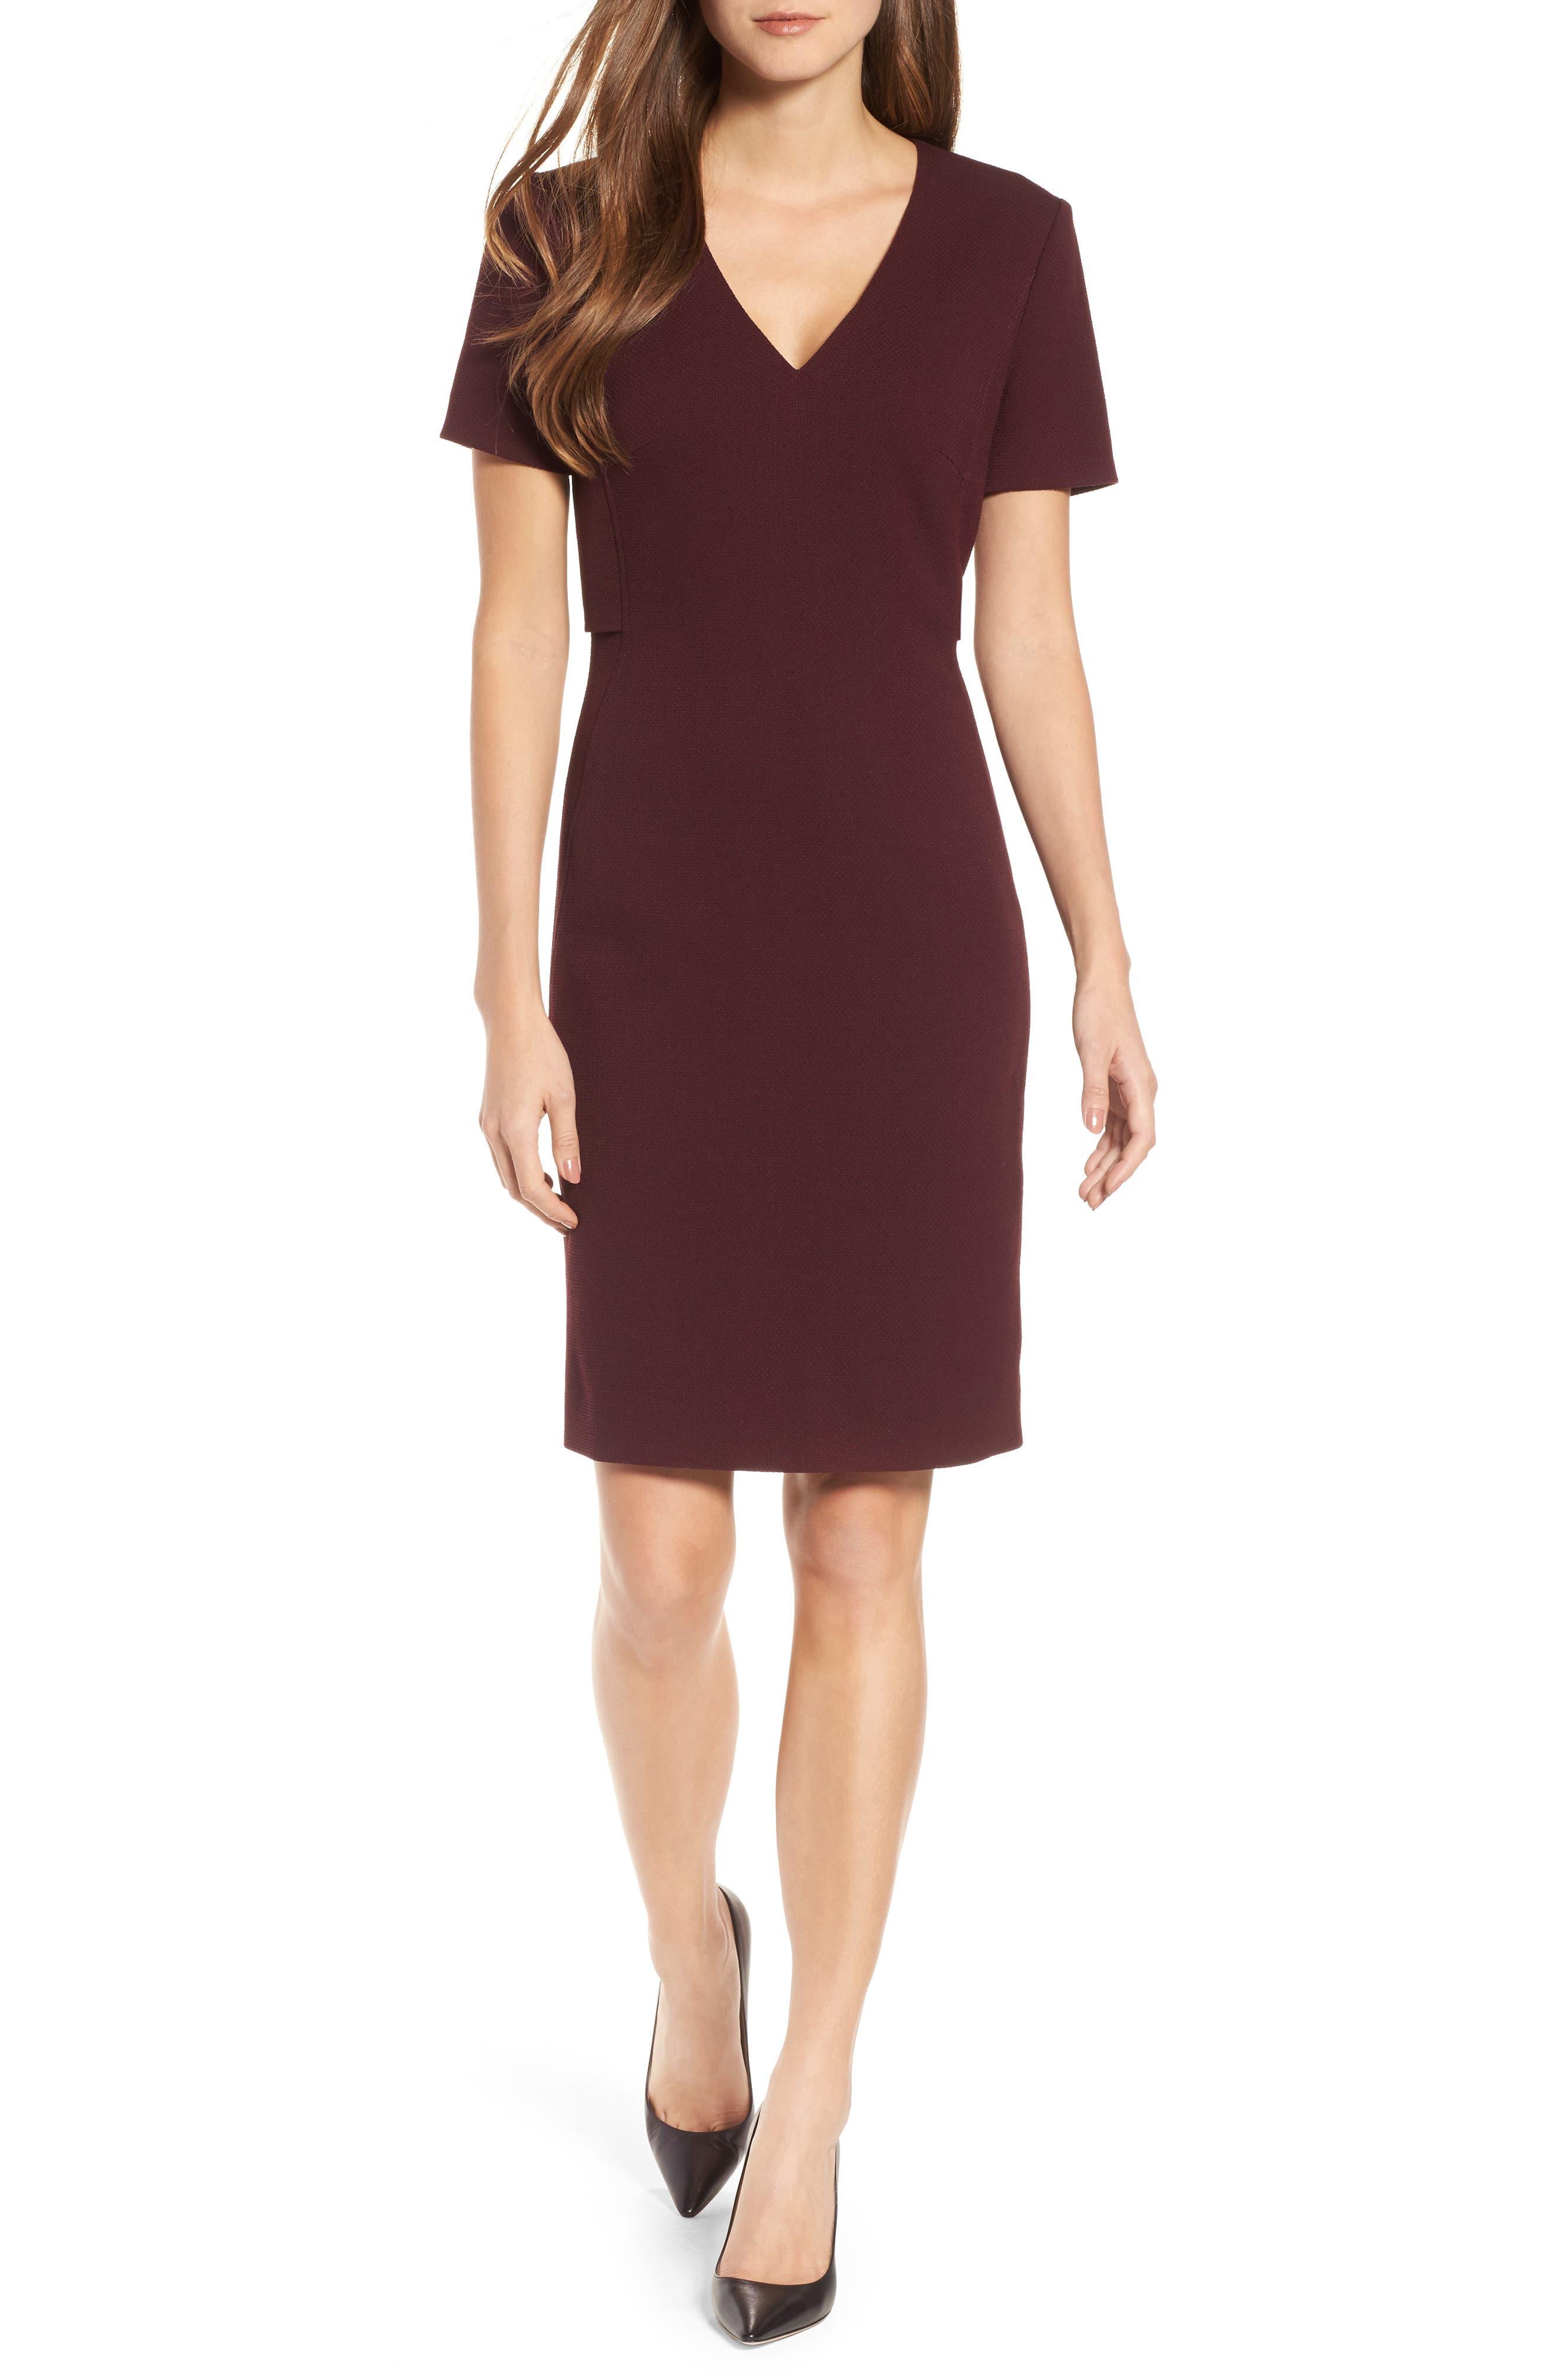 Domandia Stretch Wool Sheath Dress,                             Main thumbnail 1, color,                             Mulberry